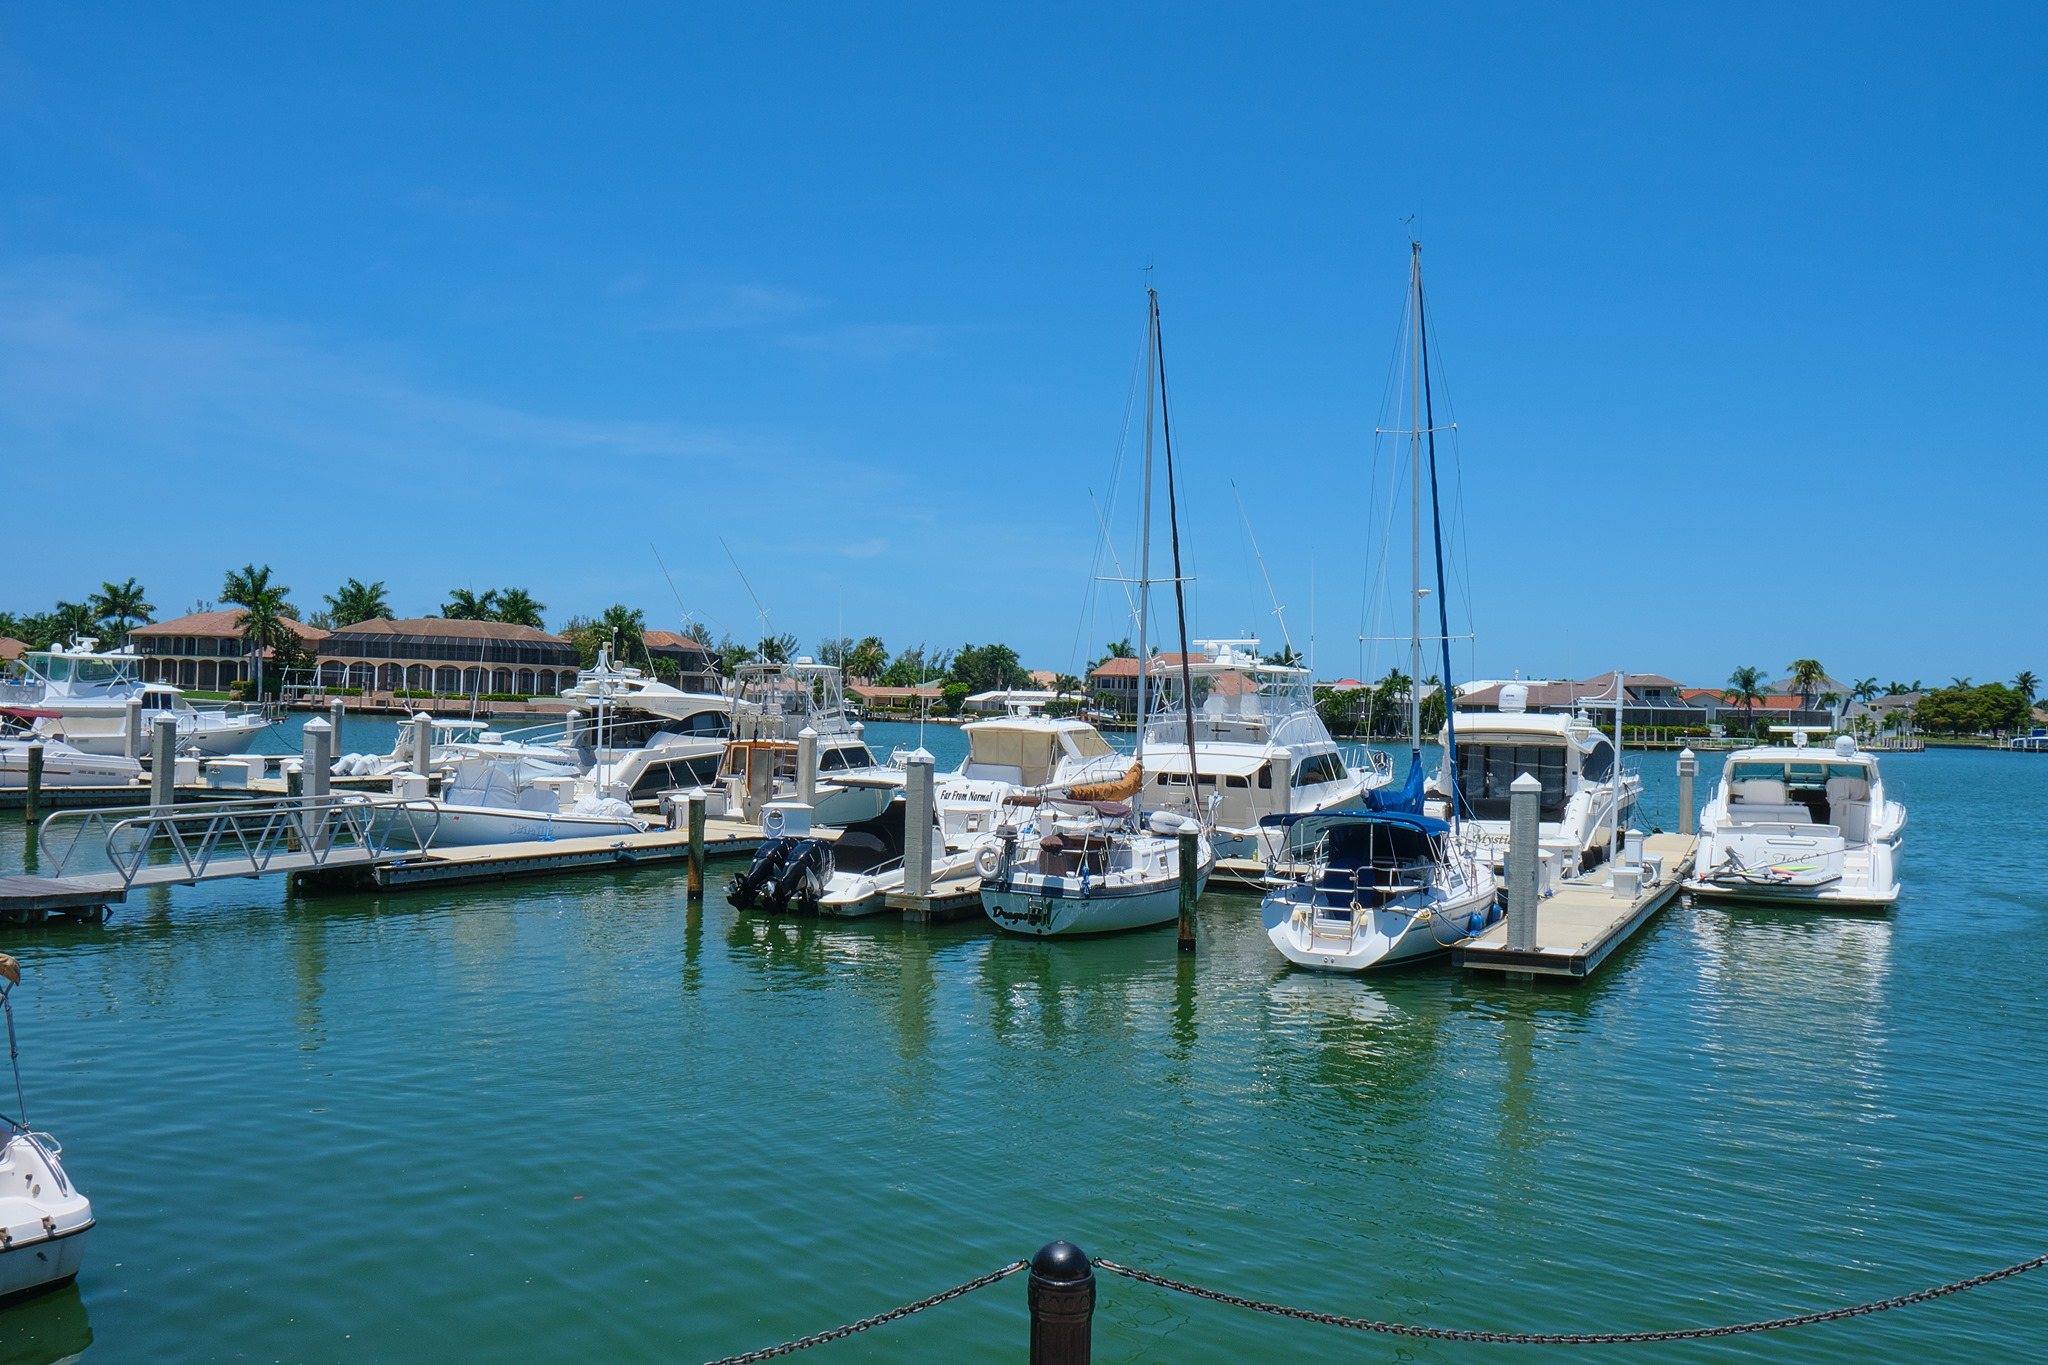 Boats near the resort